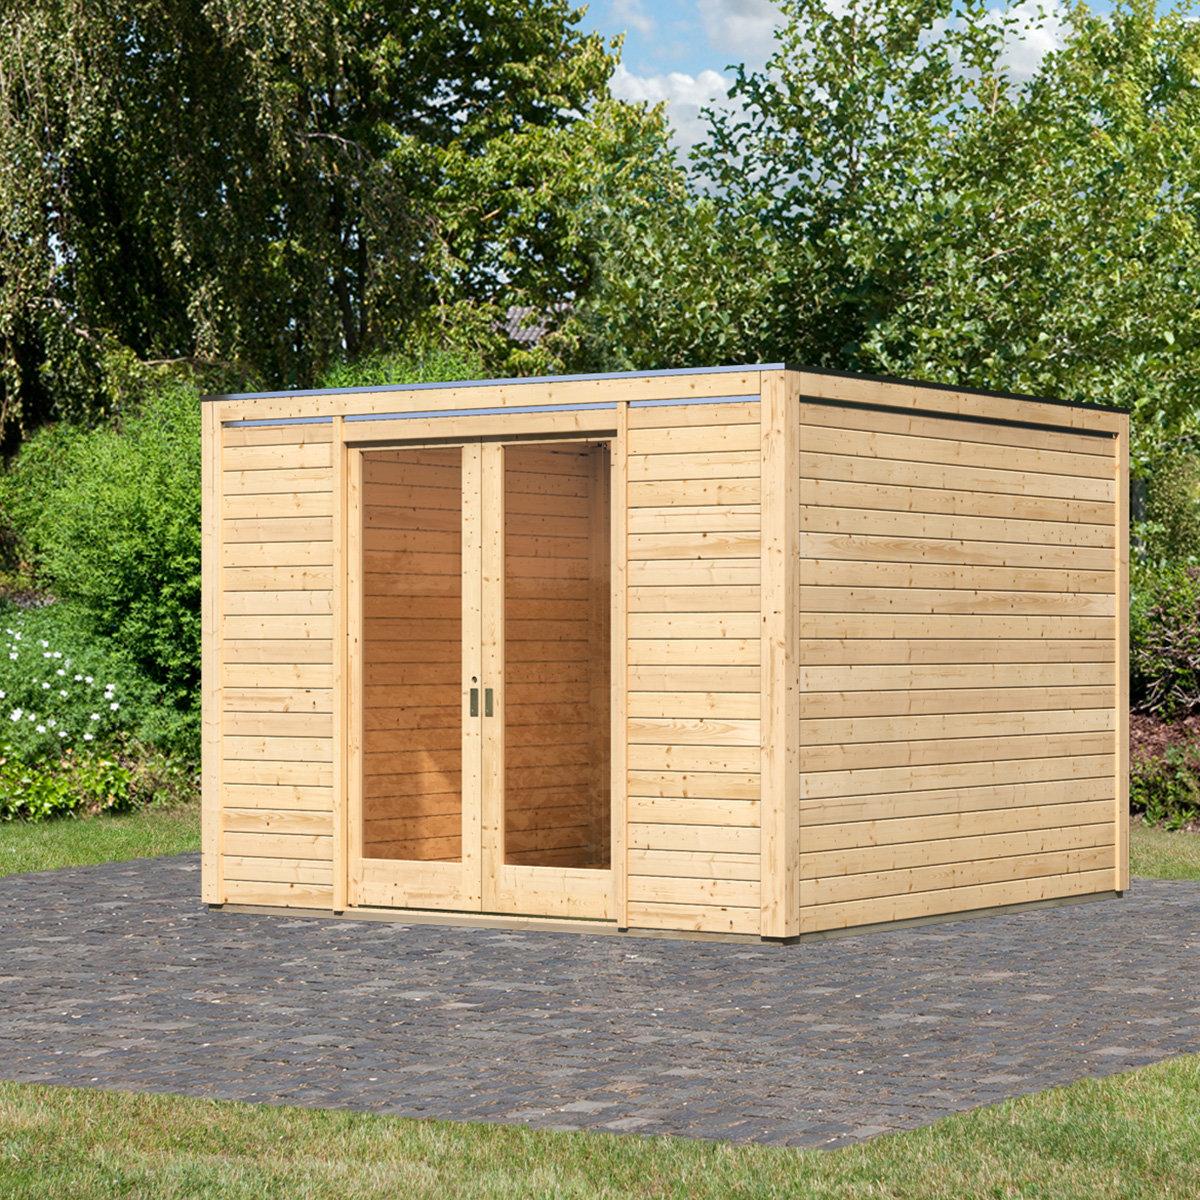 karibu gartenhaus cubus front naturfarben 28 mm von. Black Bedroom Furniture Sets. Home Design Ideas